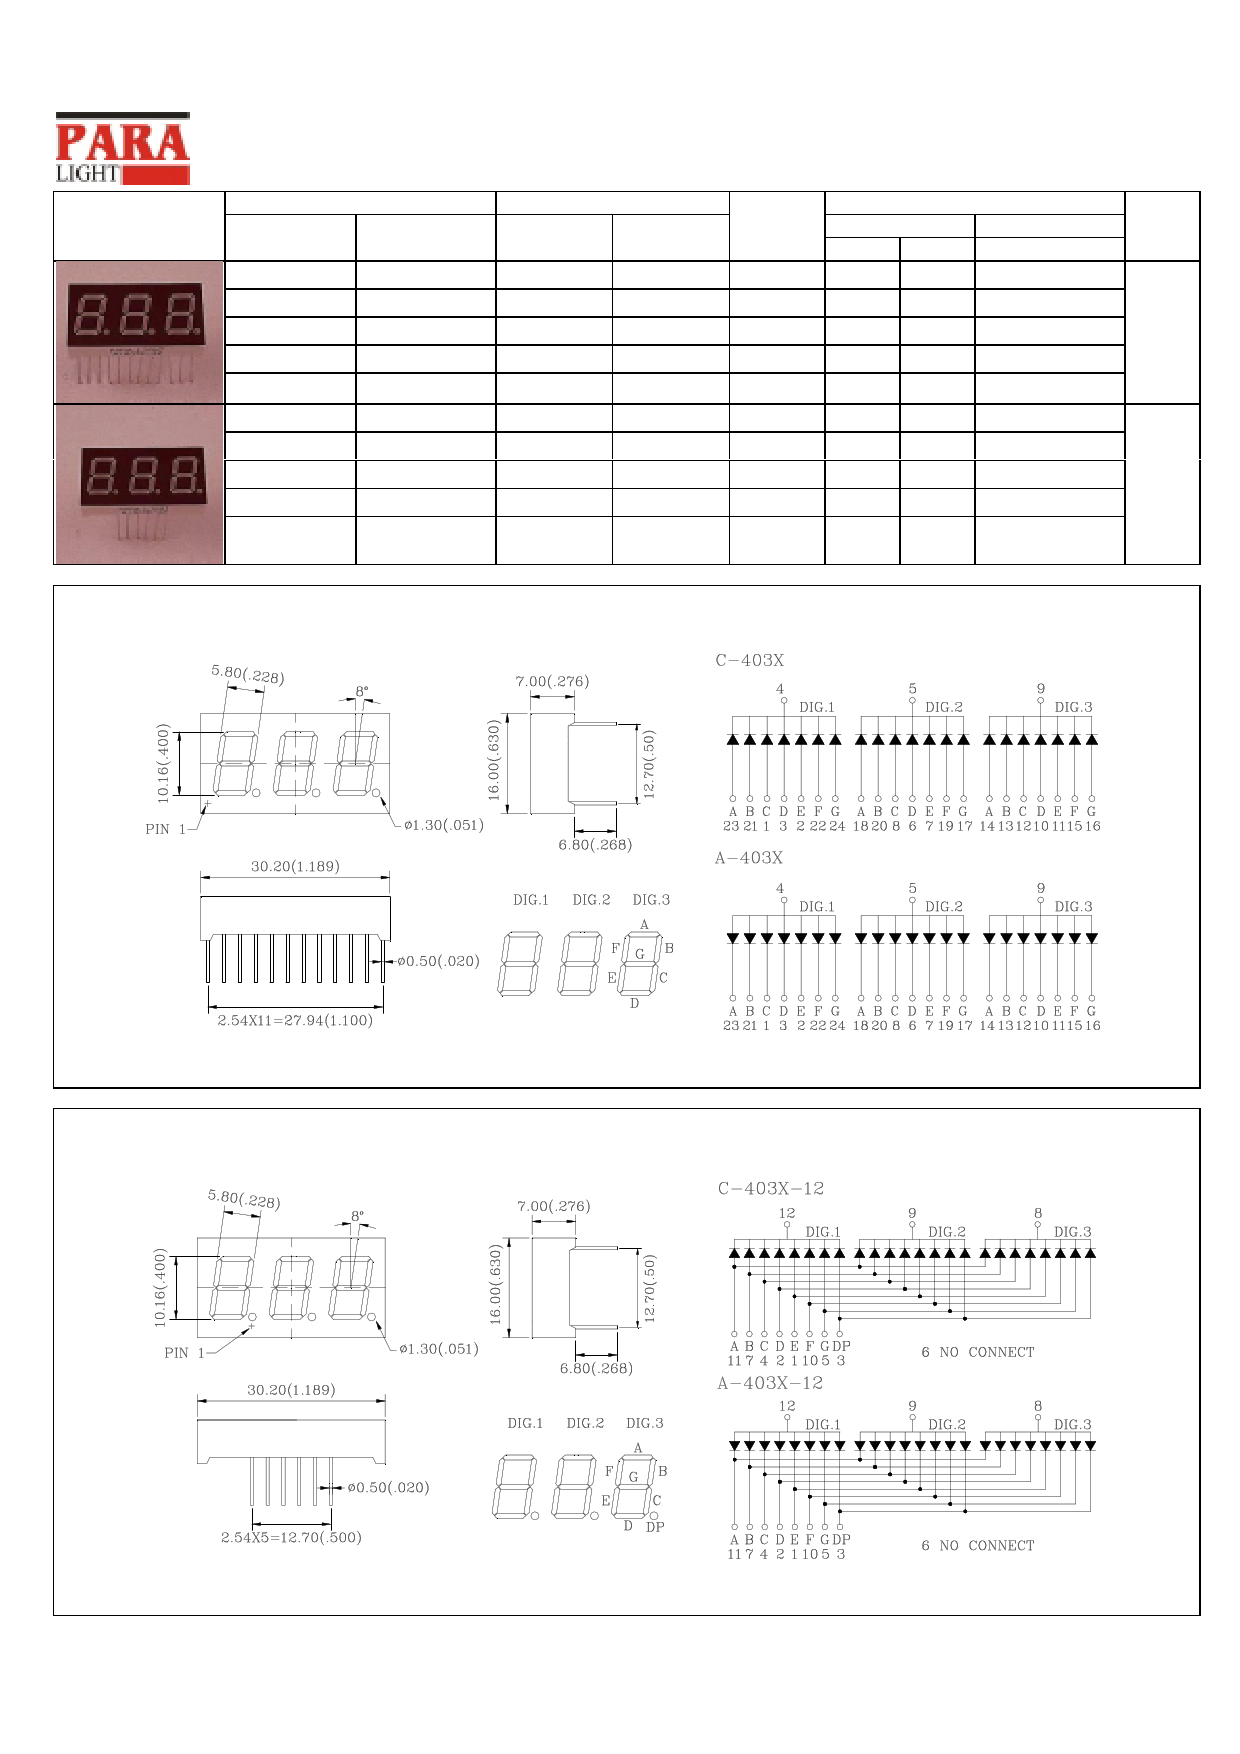 C-403E-12 datasheet